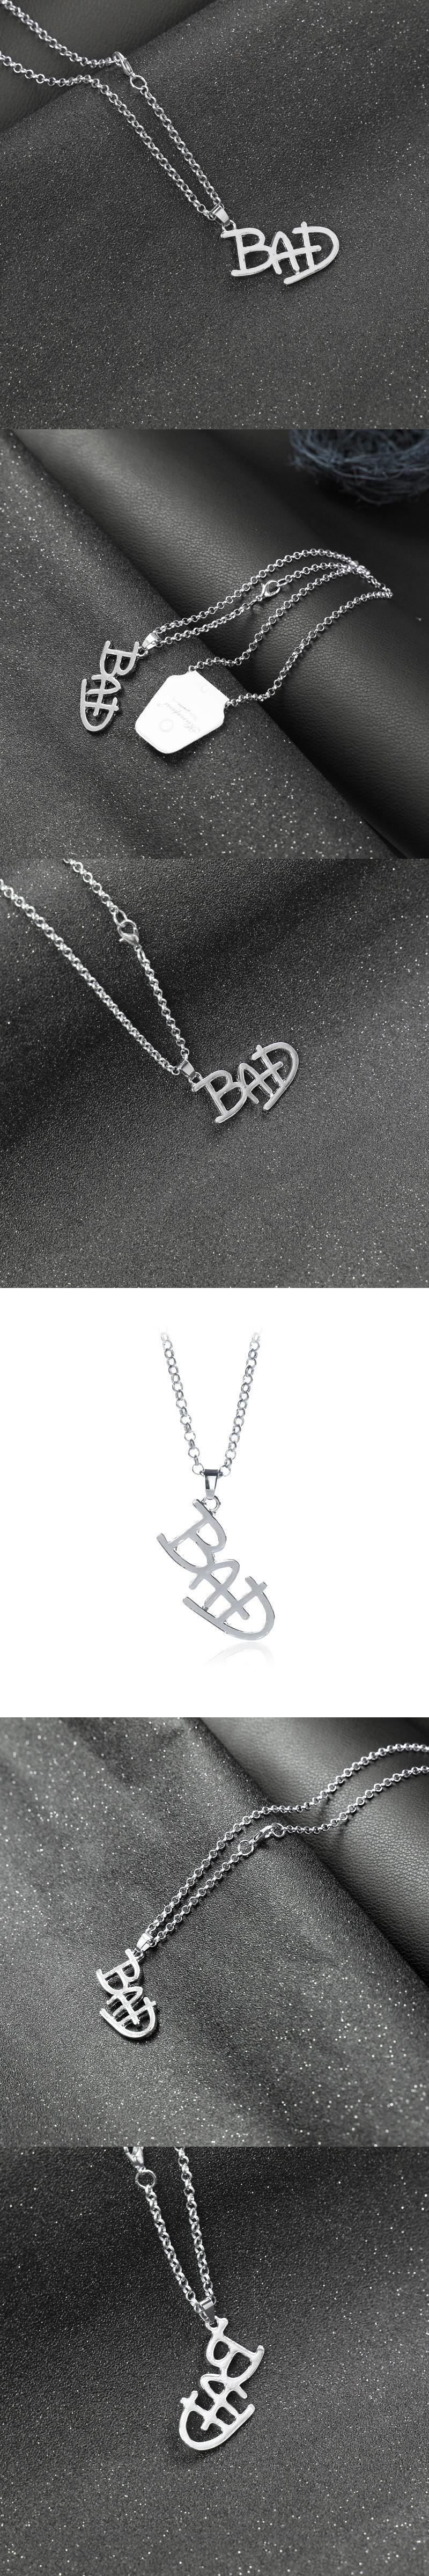 2017 New MJ Necklace souvenir for Michael Jackson BAD LOGO Pendent  Memorable Ornament for MJ